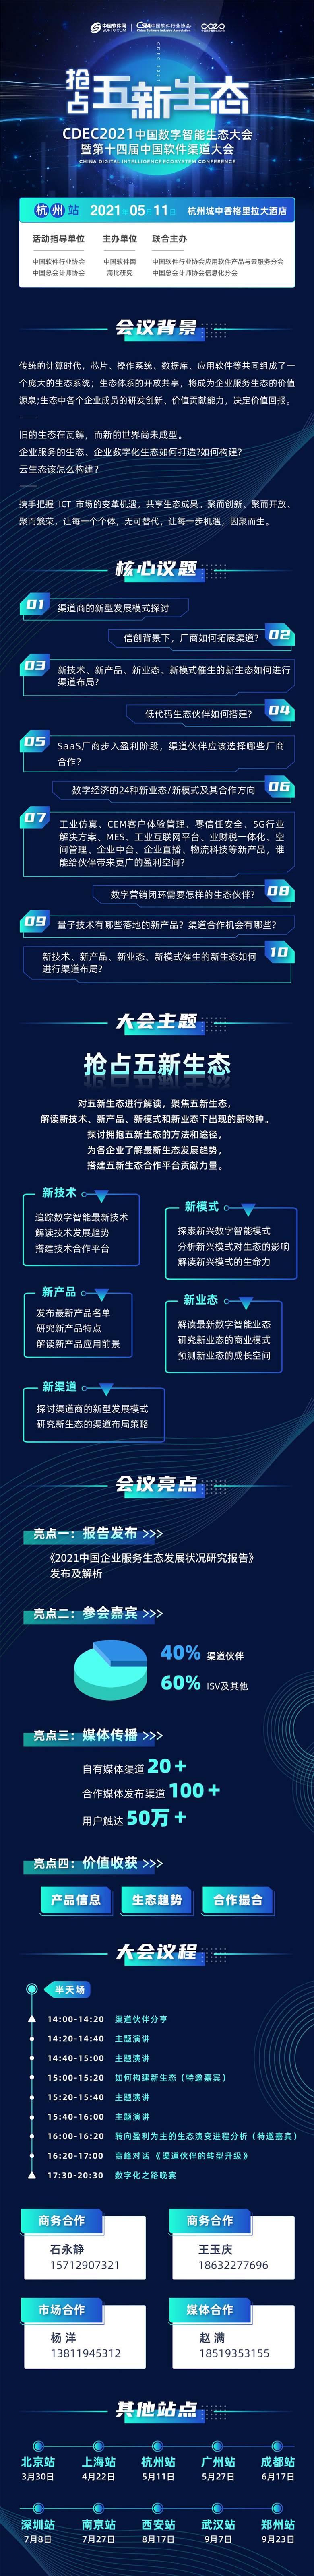 2021cdec长图-杭州站-01.jpg